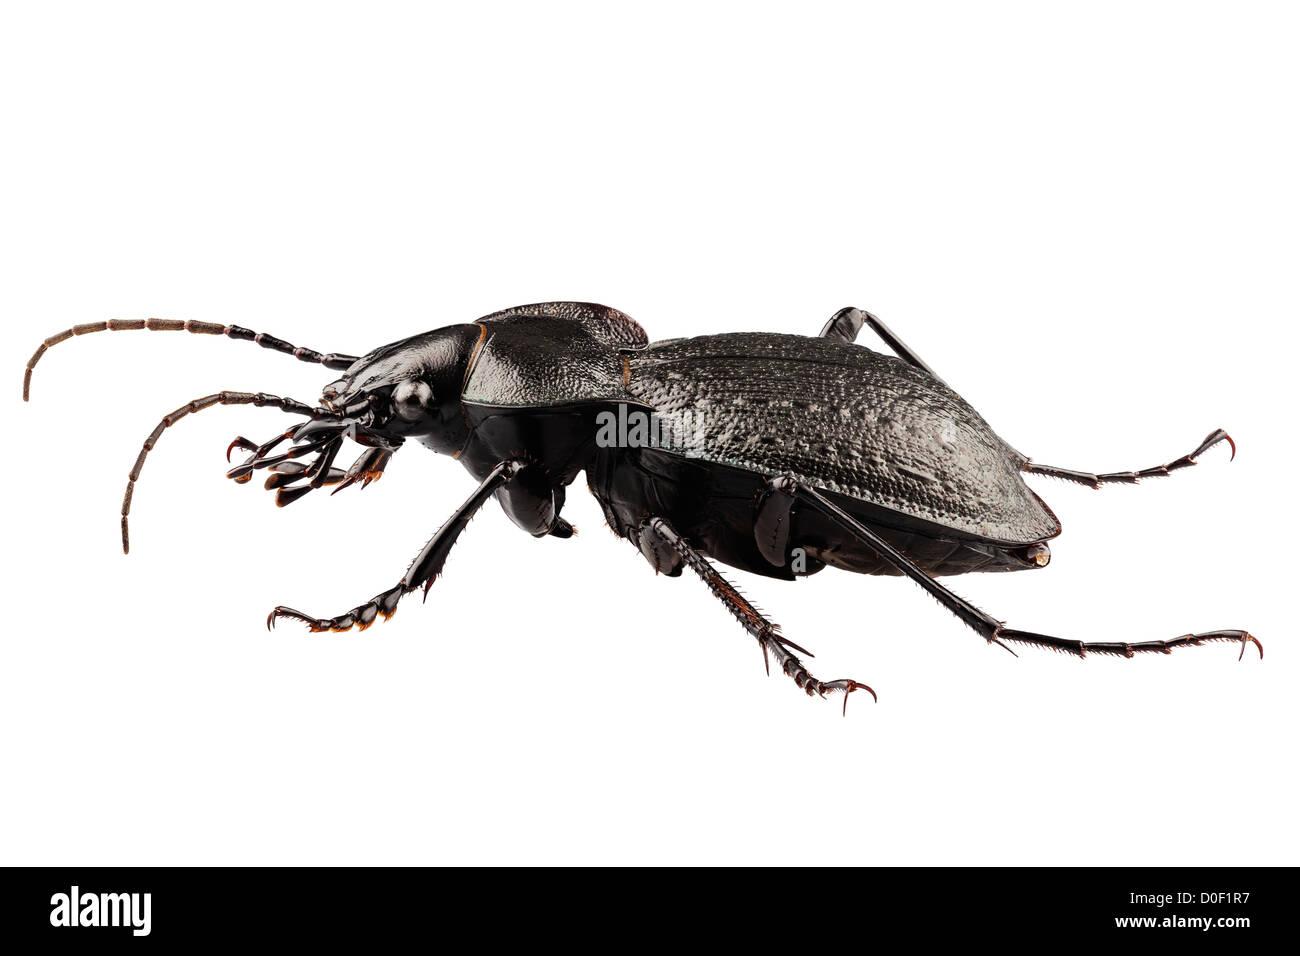 Käfer Arten Carabus Coriaceus Stockfoto Bild 51961819 Alamy